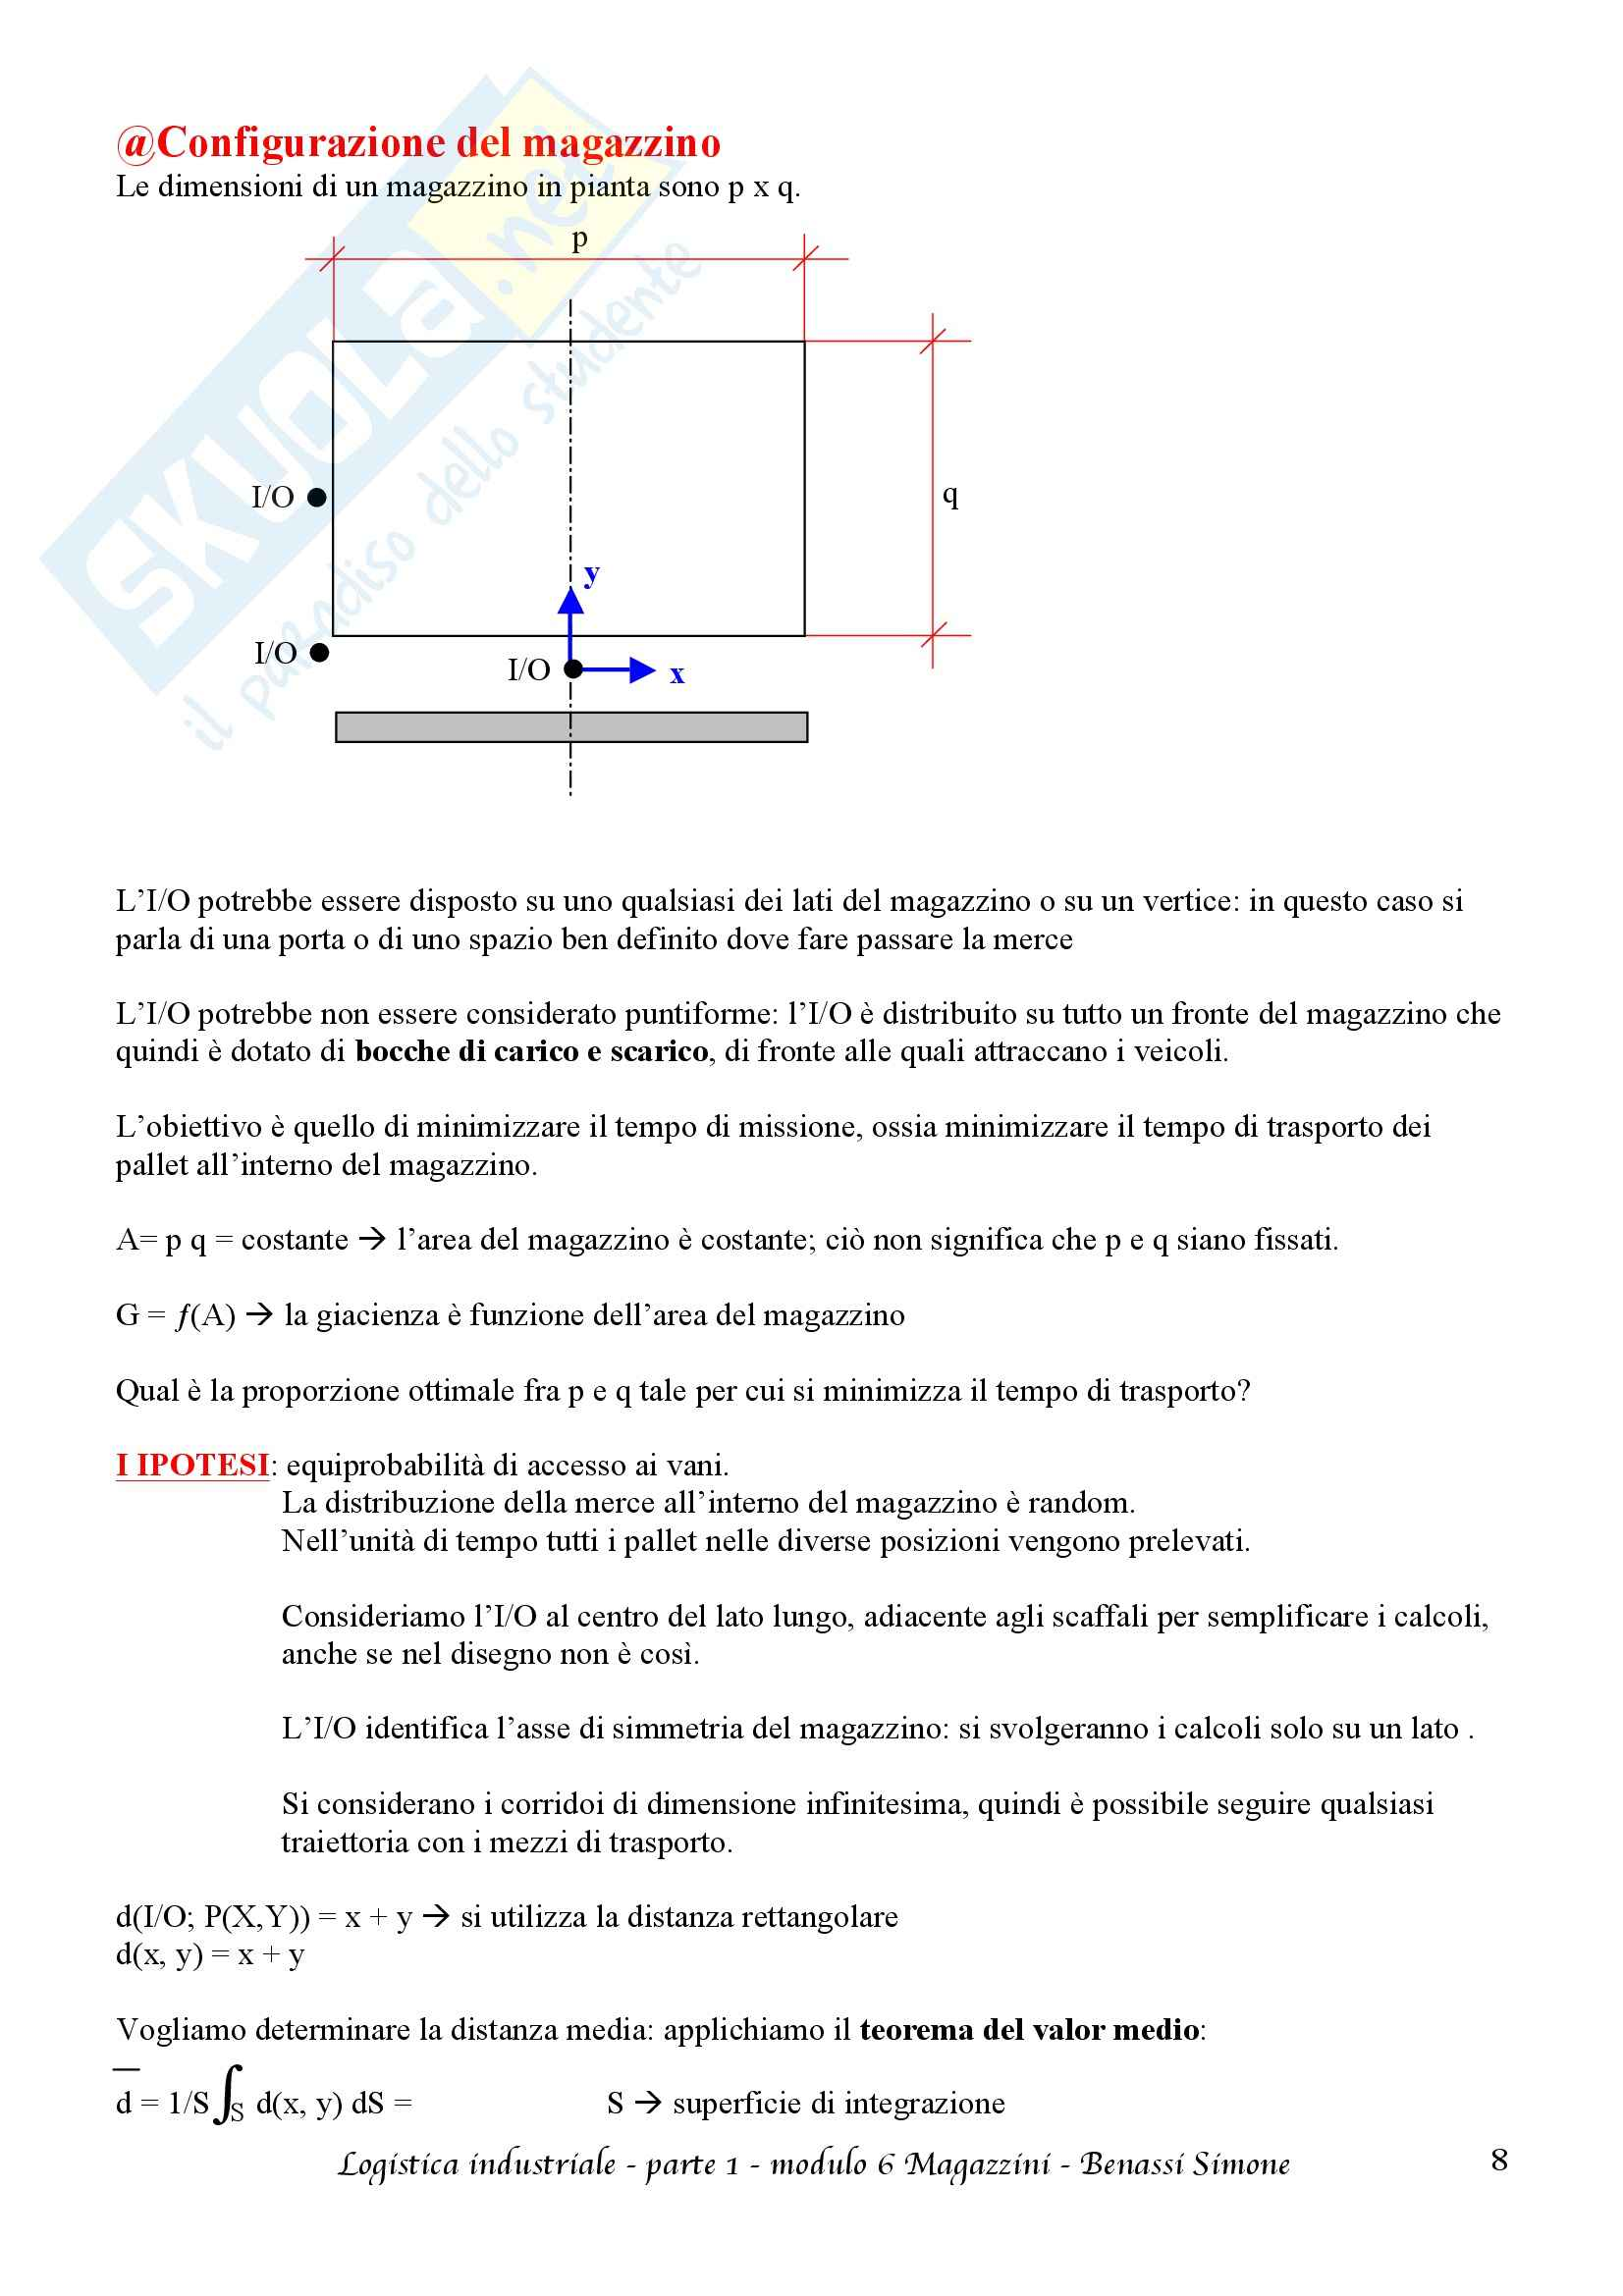 Logistica industriale T-AB - Appunti prima parte Pag. 41